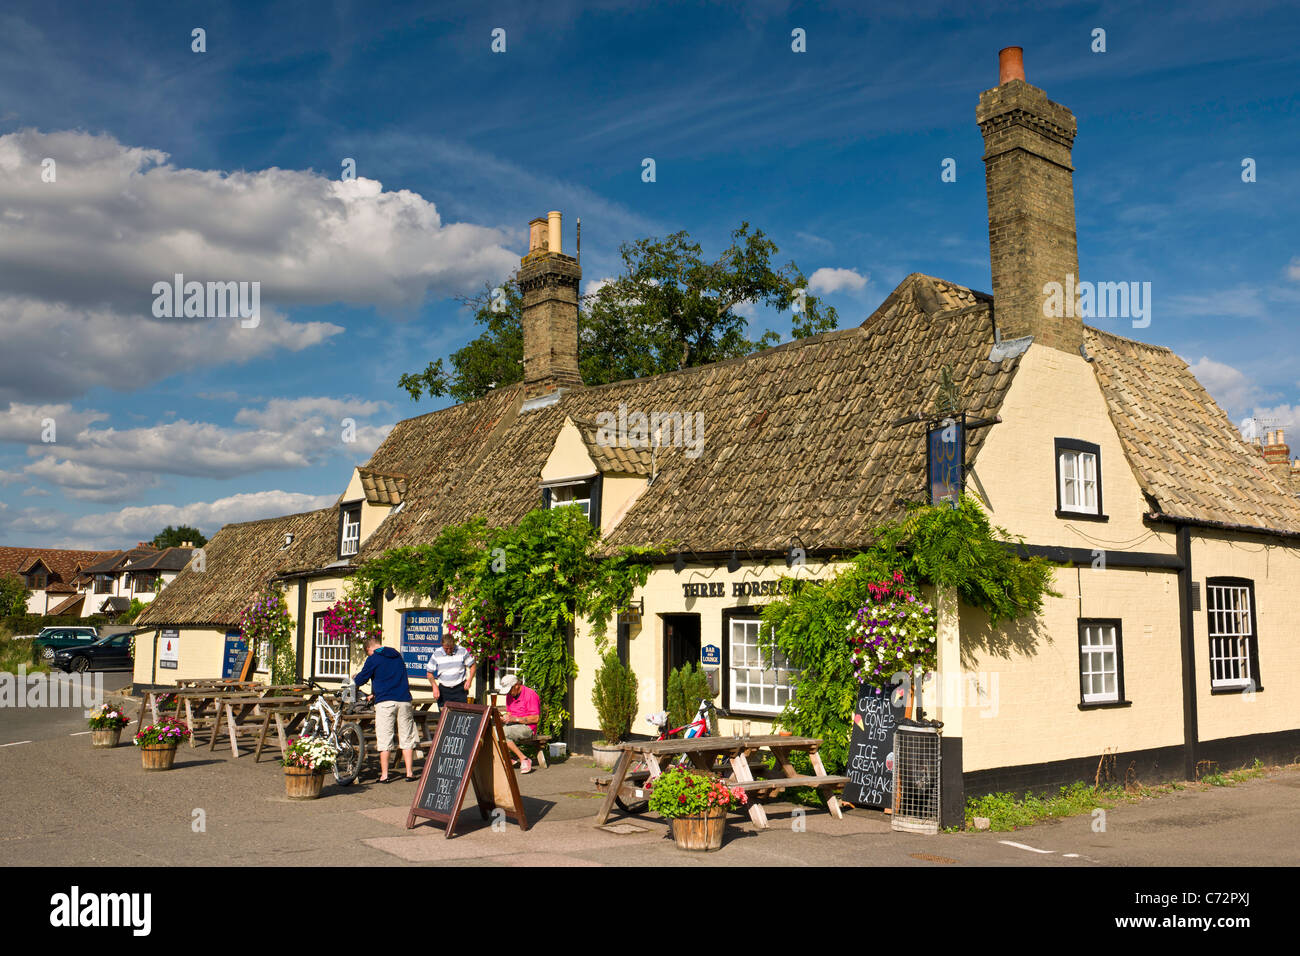 Traditional English Pub - Stock Image